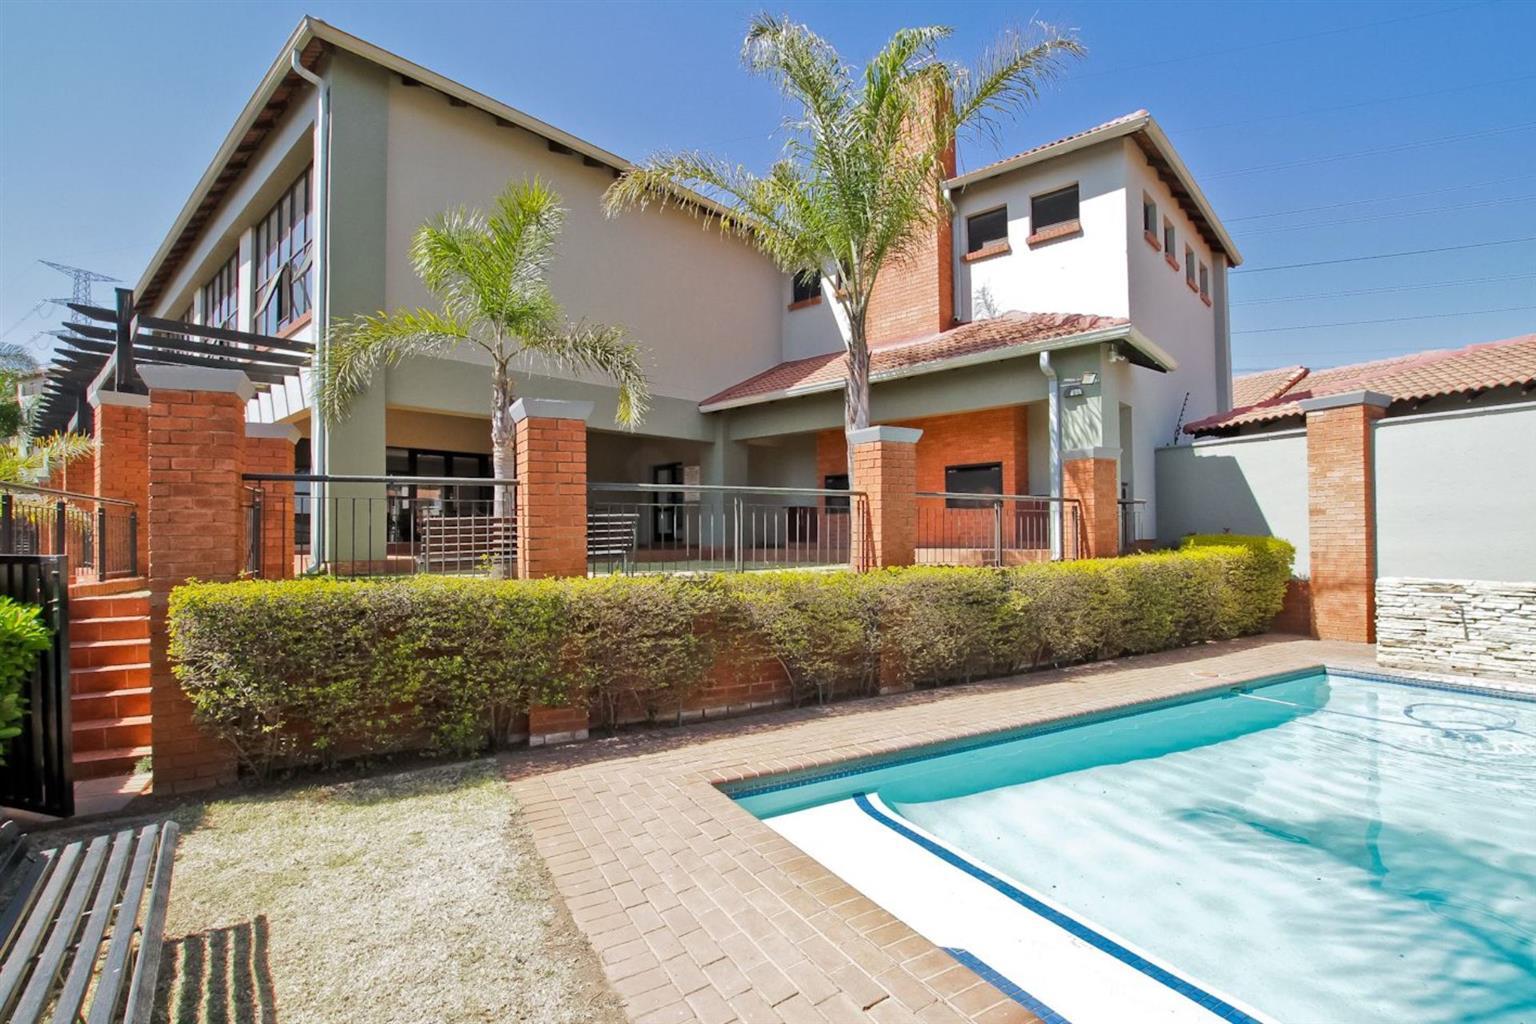 Apartment Rental Monthly in SOLHEIM